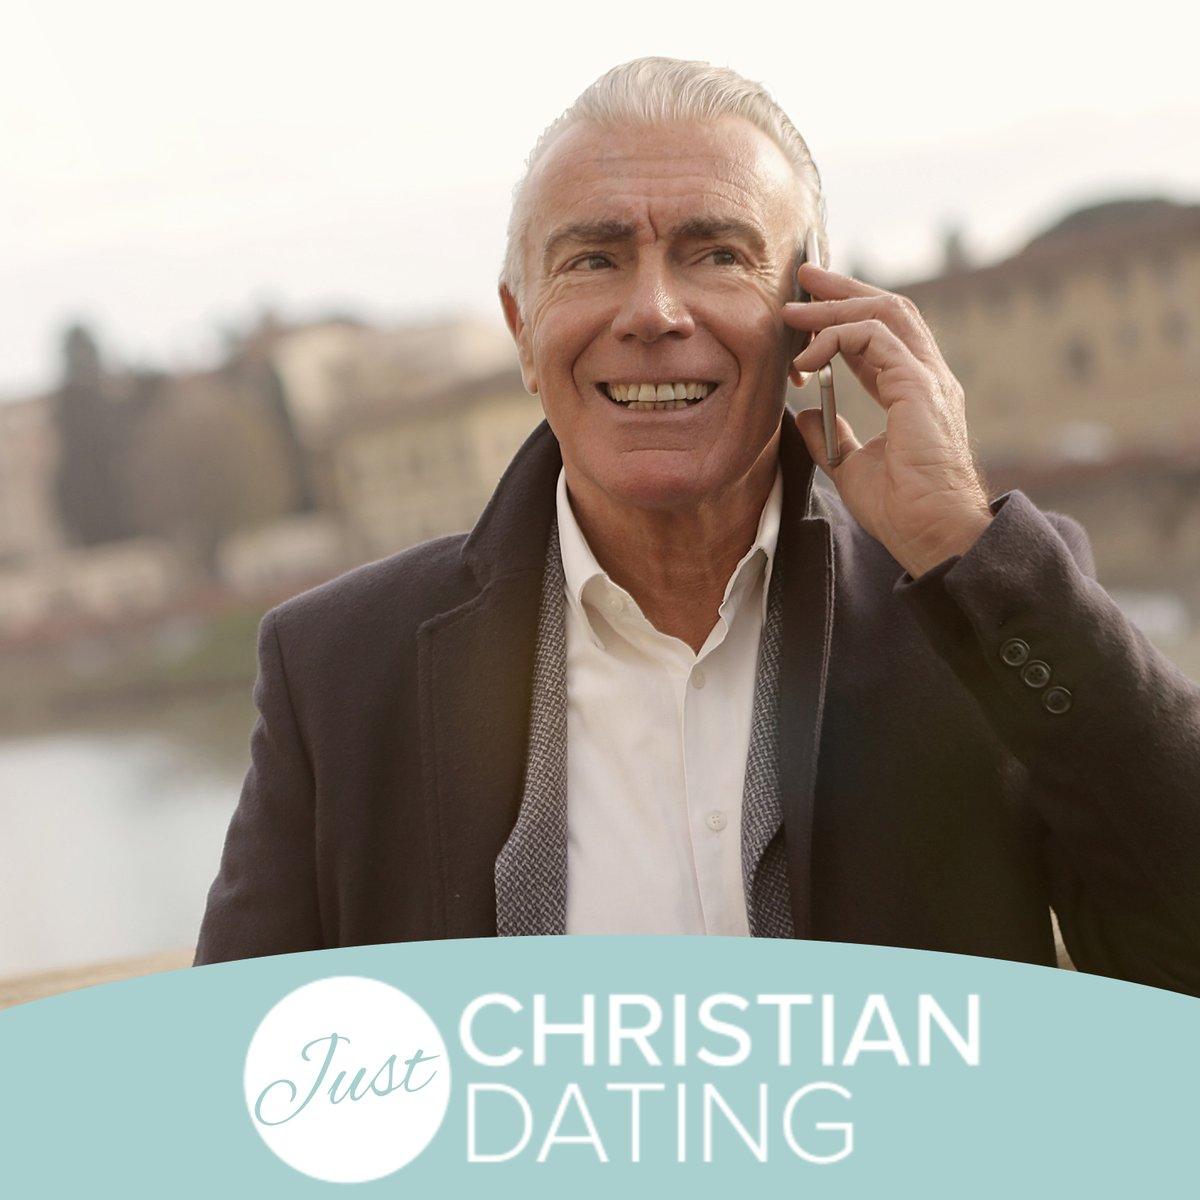 Just christian dating.com professor dating